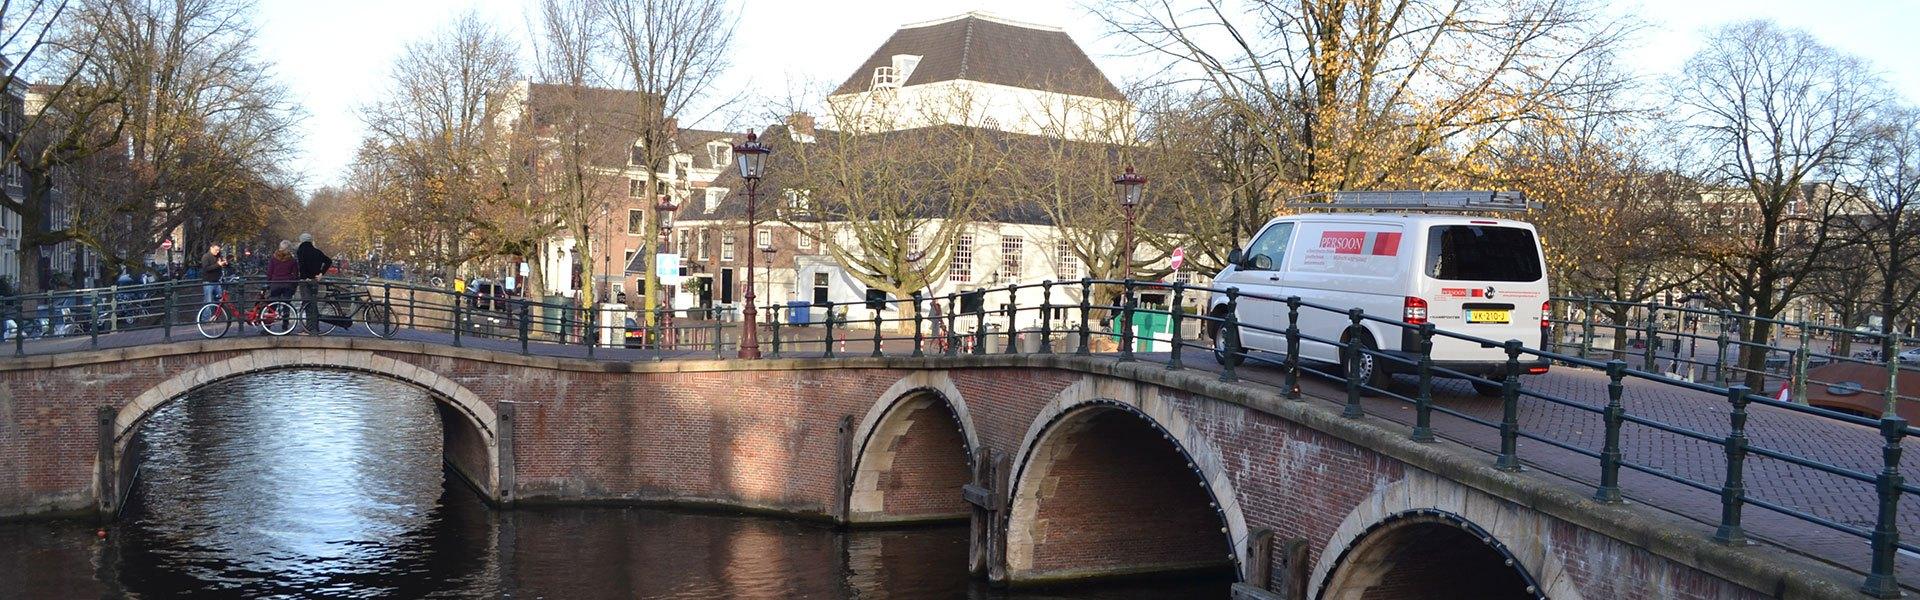 Gevelreiniging Amsterdam